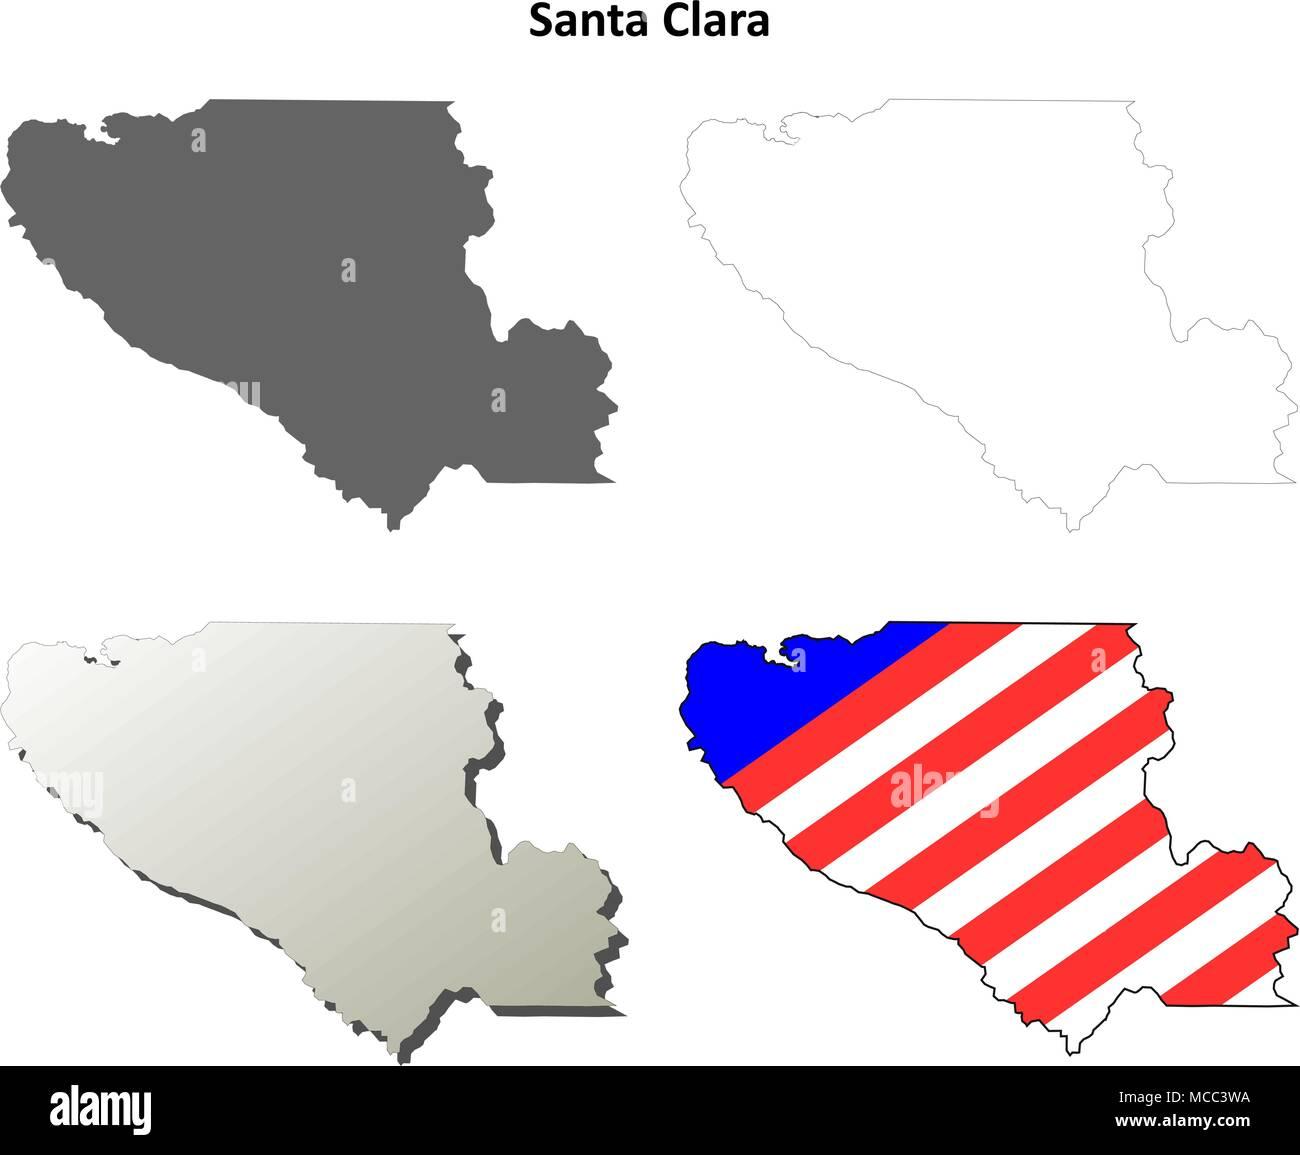 Santa Clara County California Outline Map Set